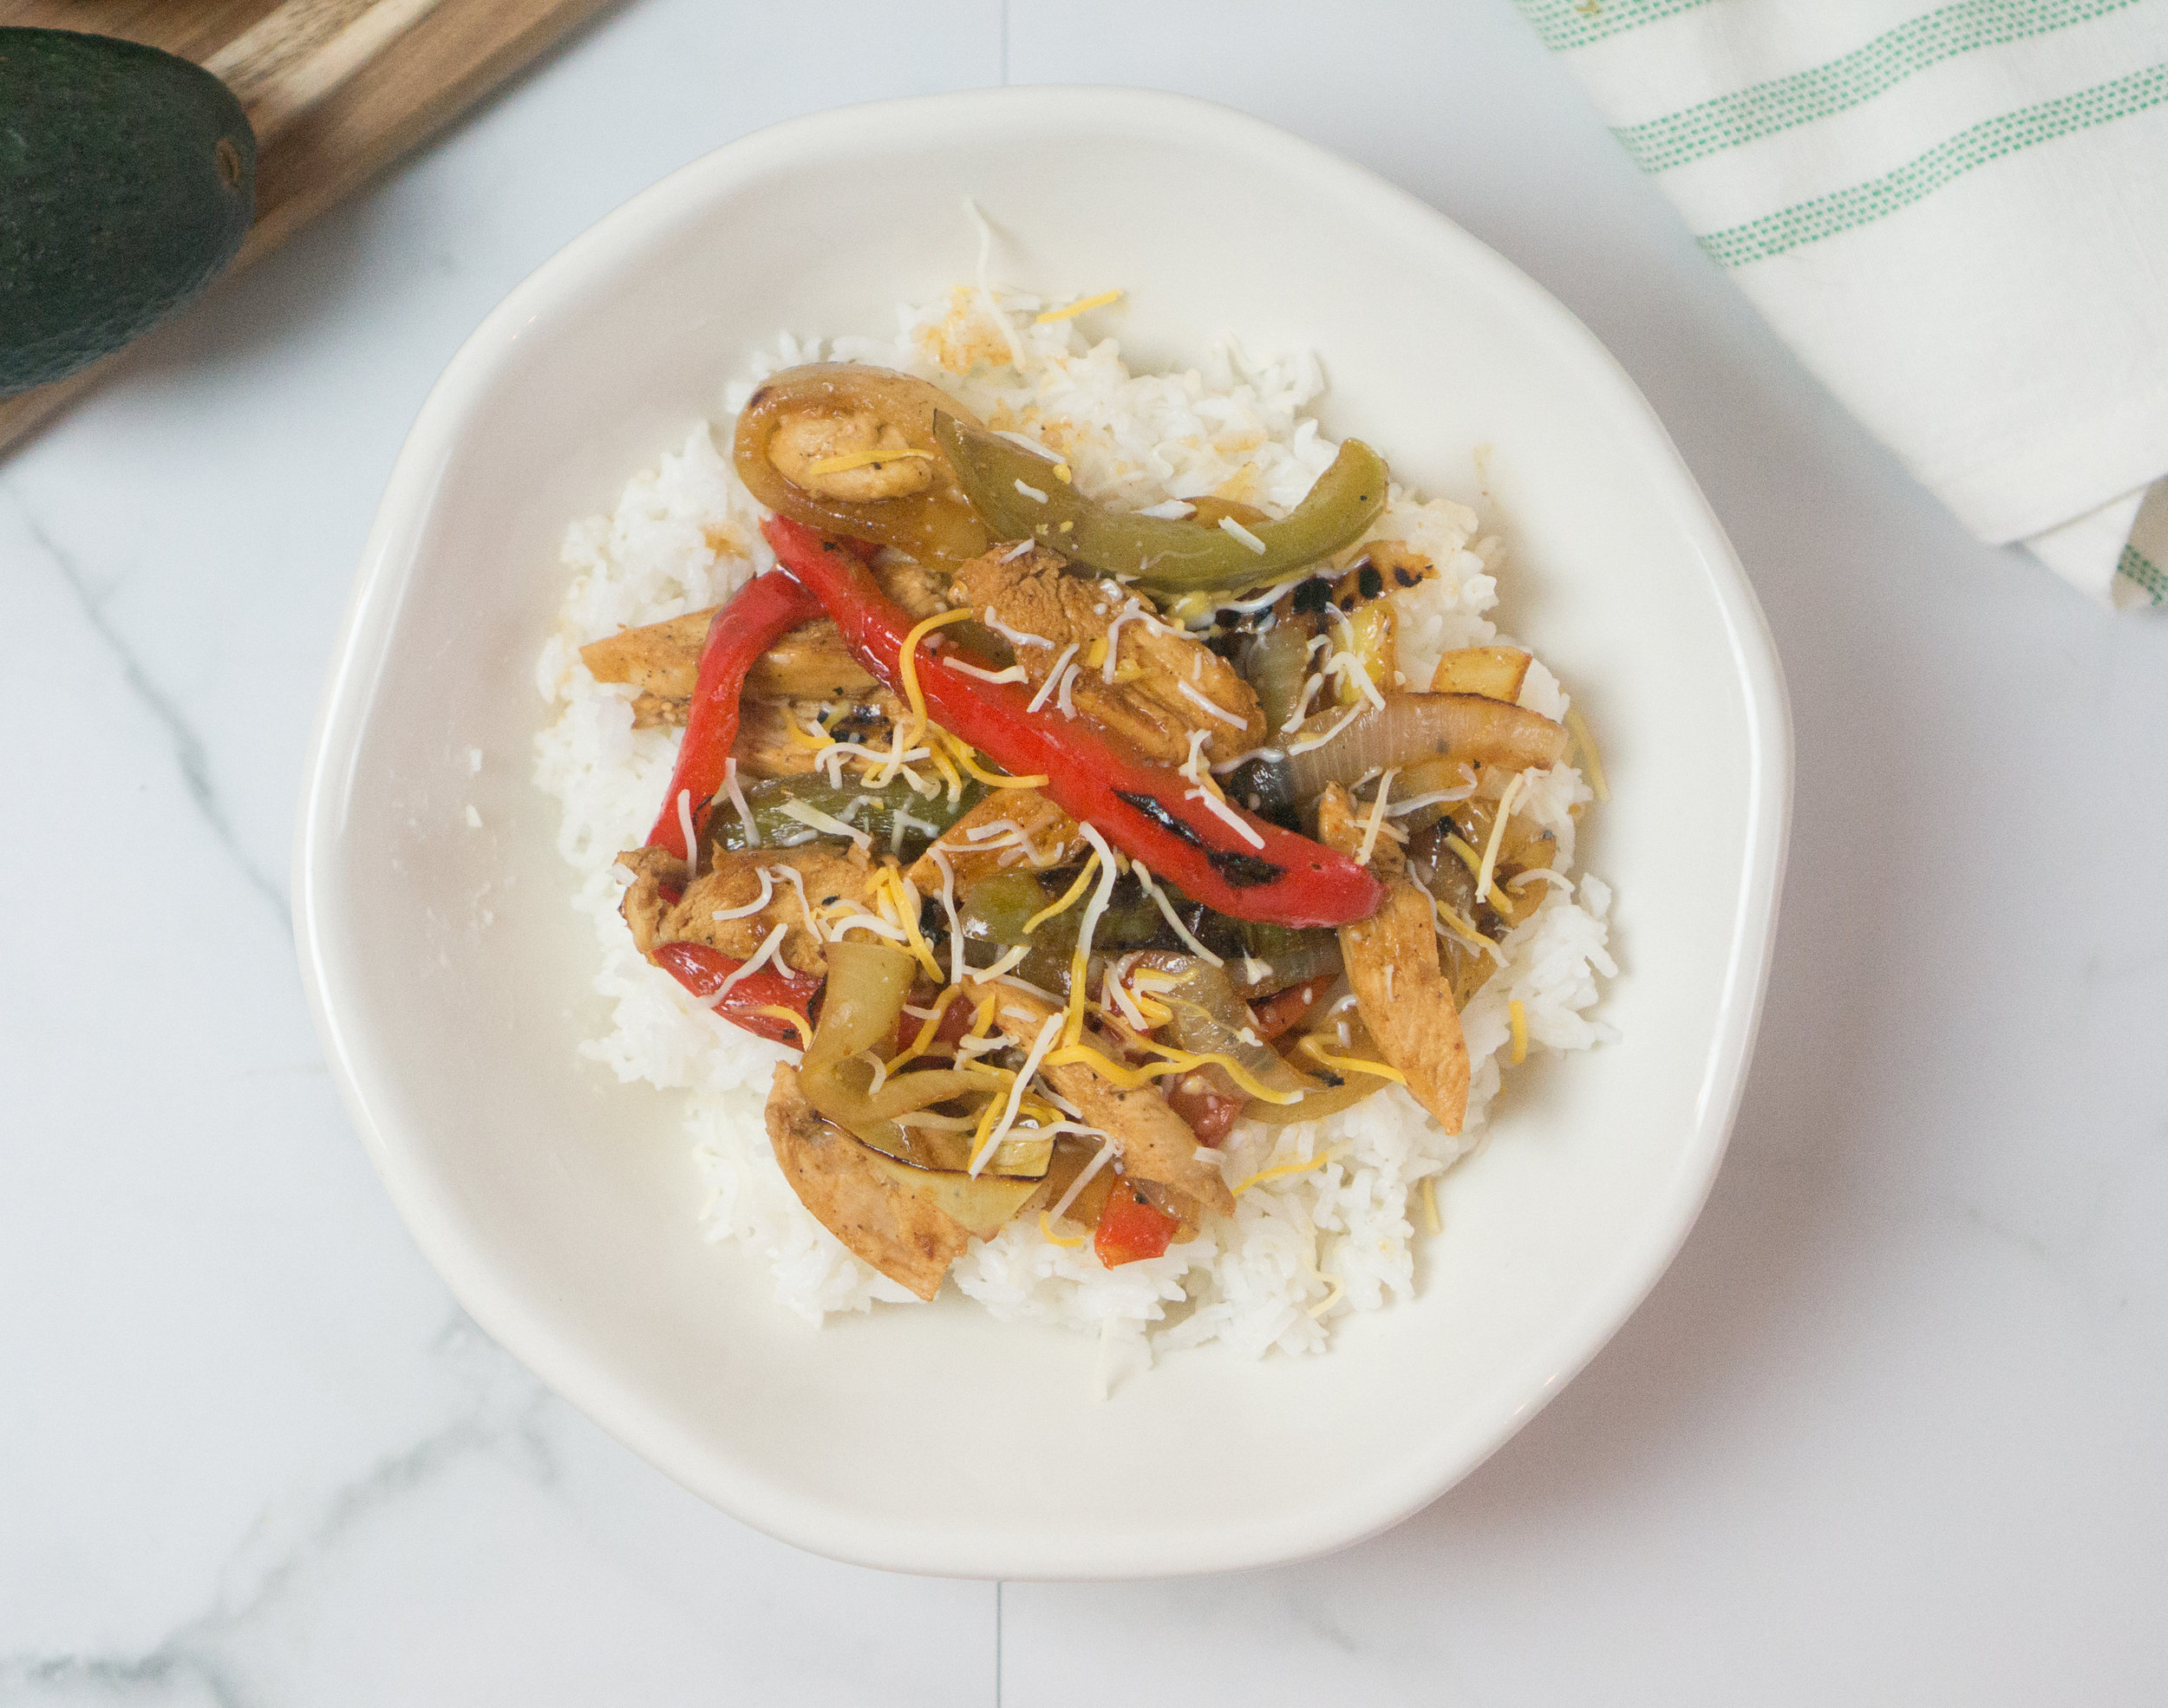 Easy Gluten Free Chicken Fajita Bowl